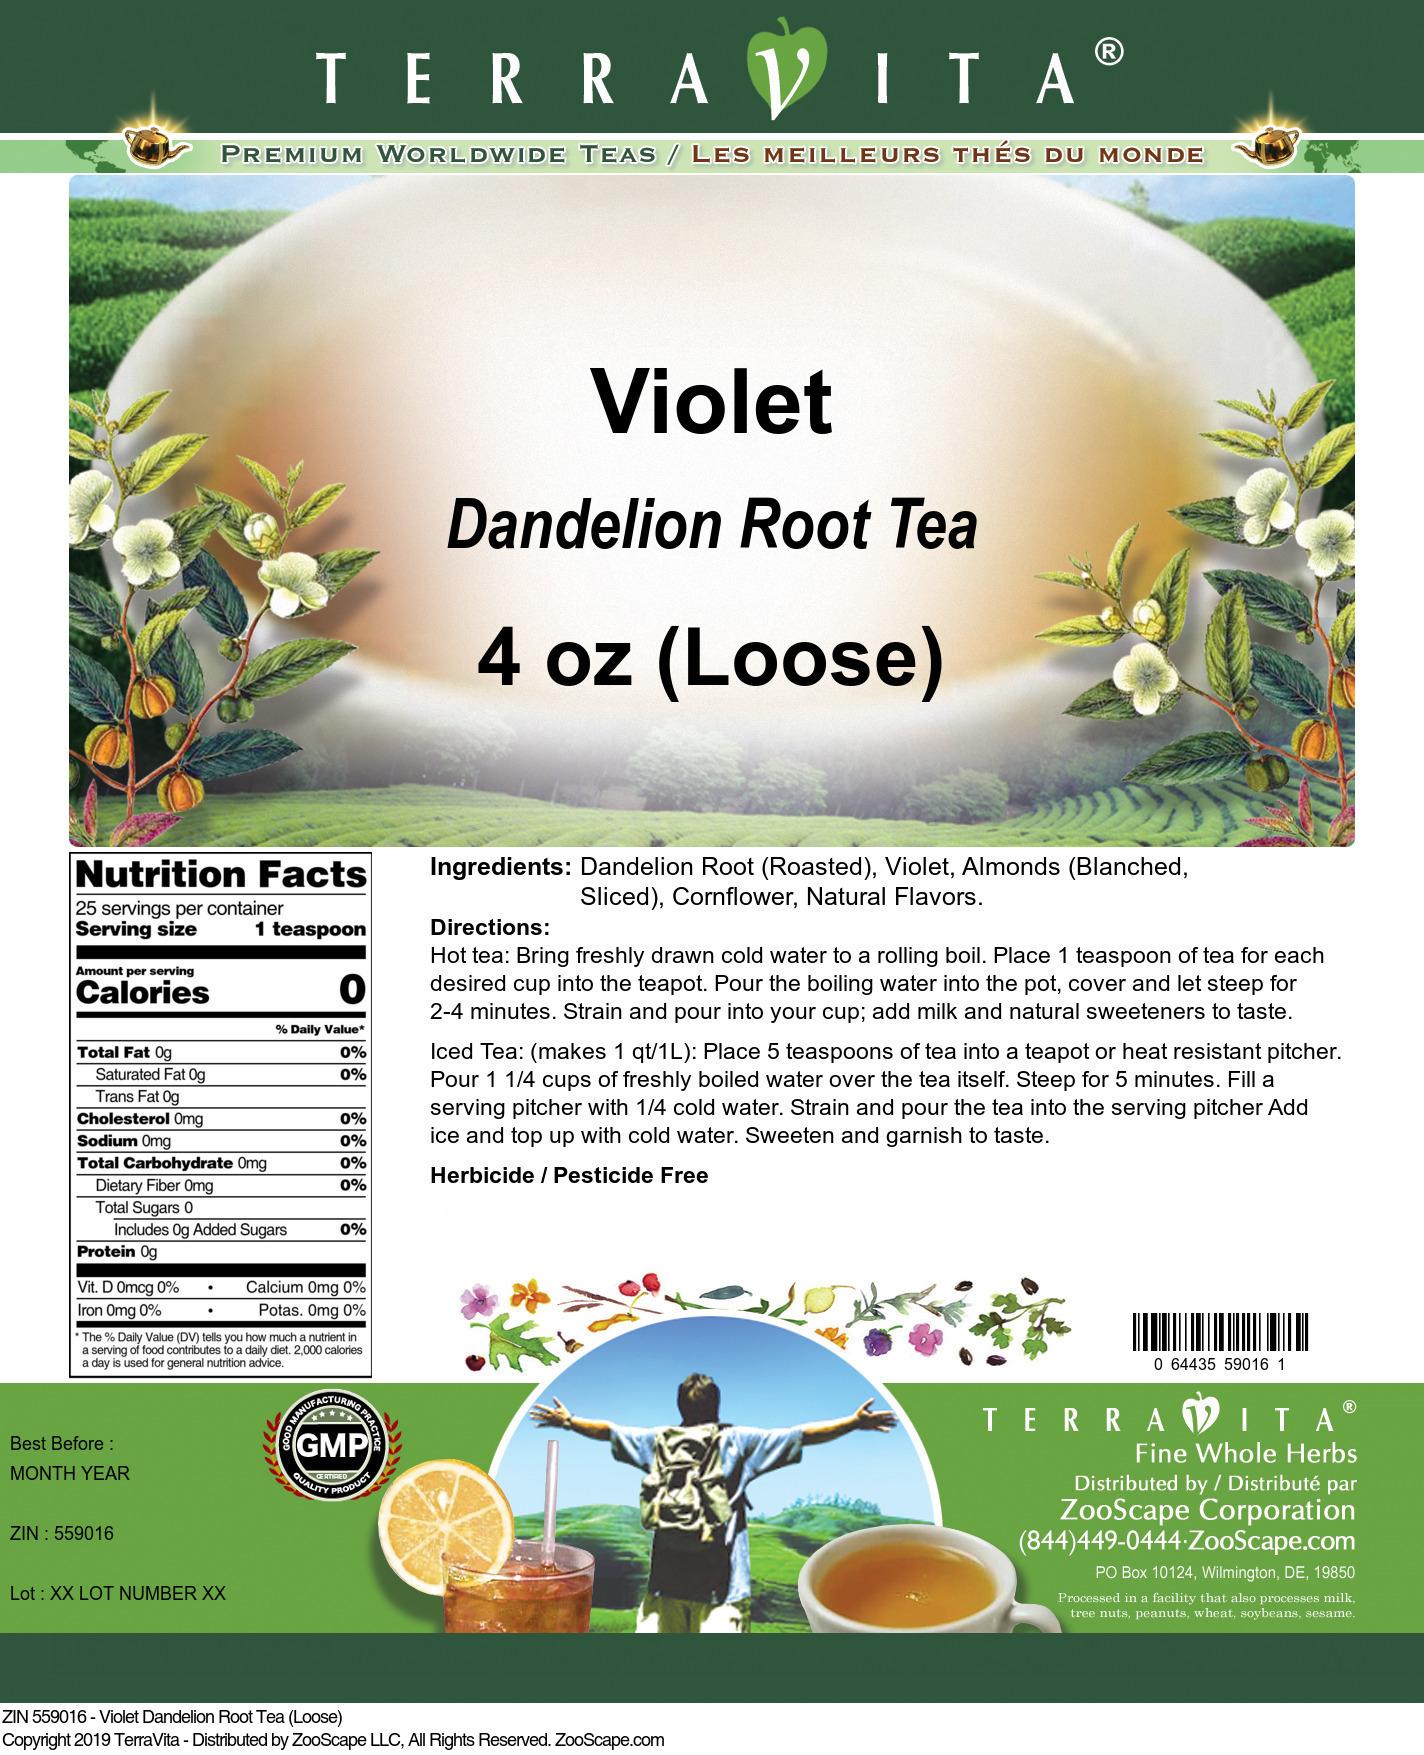 Violet Dandelion Root Tea (Loose)